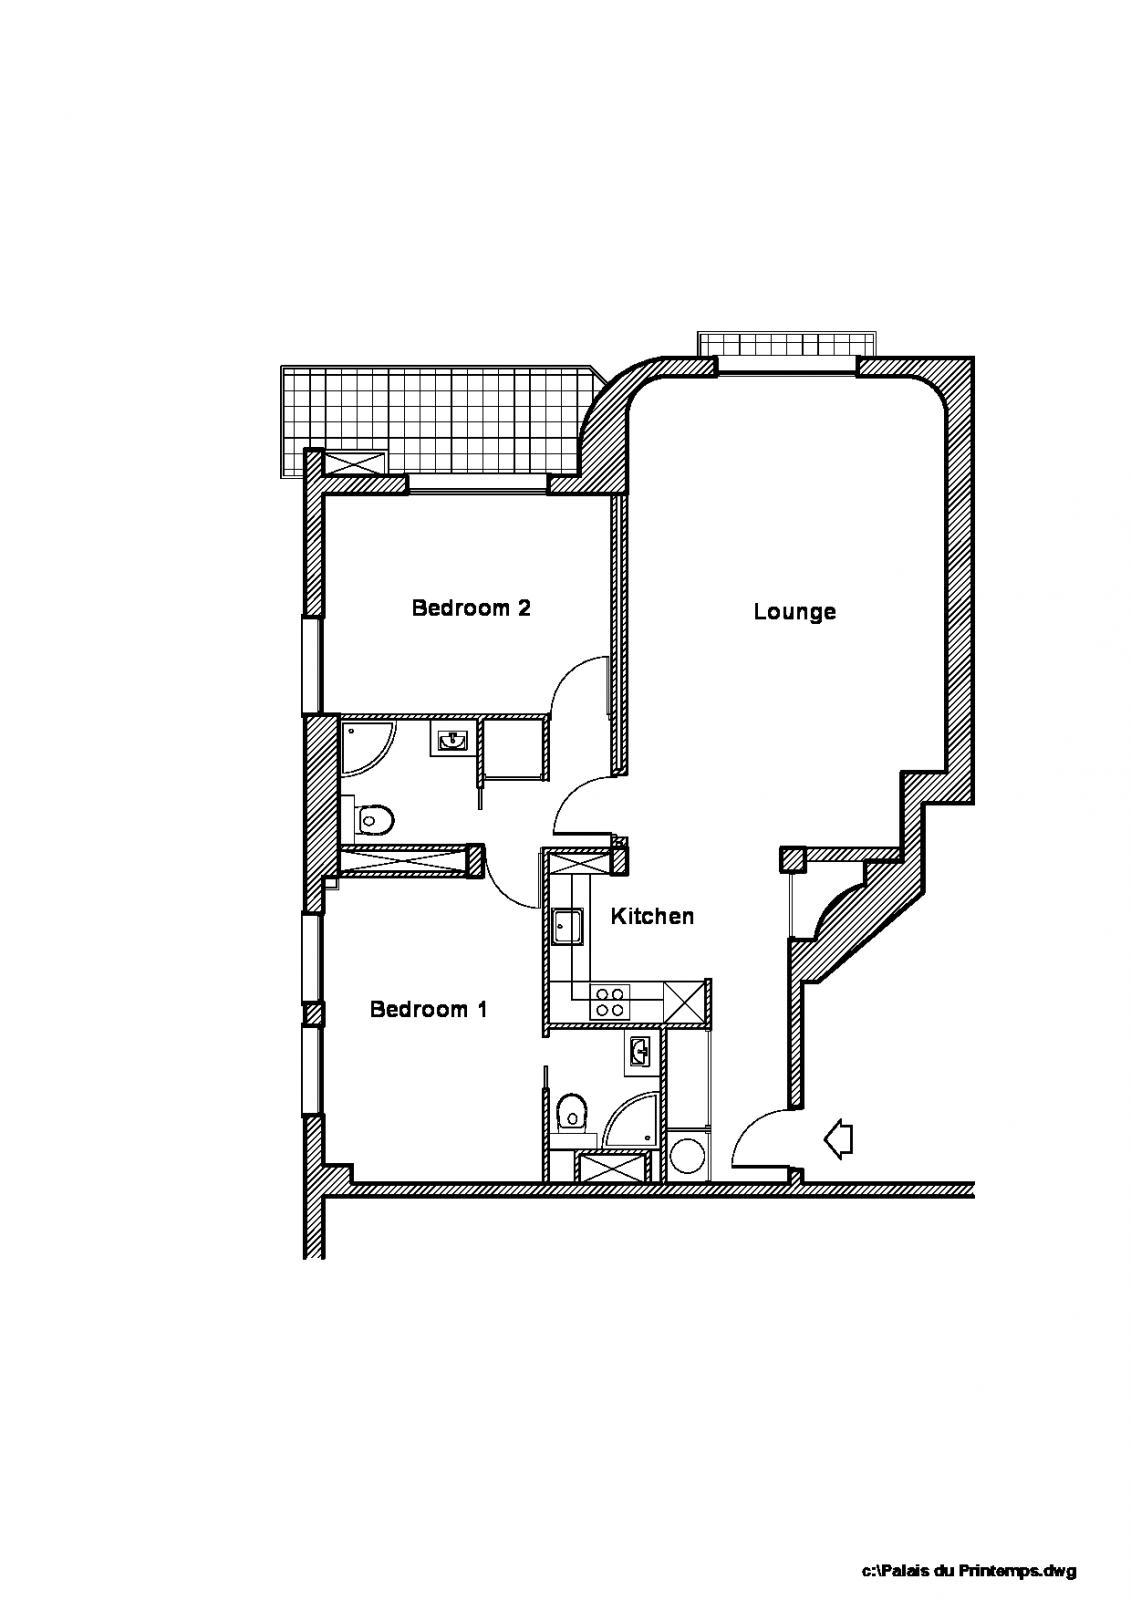 Renovated 2 bedroom, beautiful sea view - Apartment 3 rooms Monaco